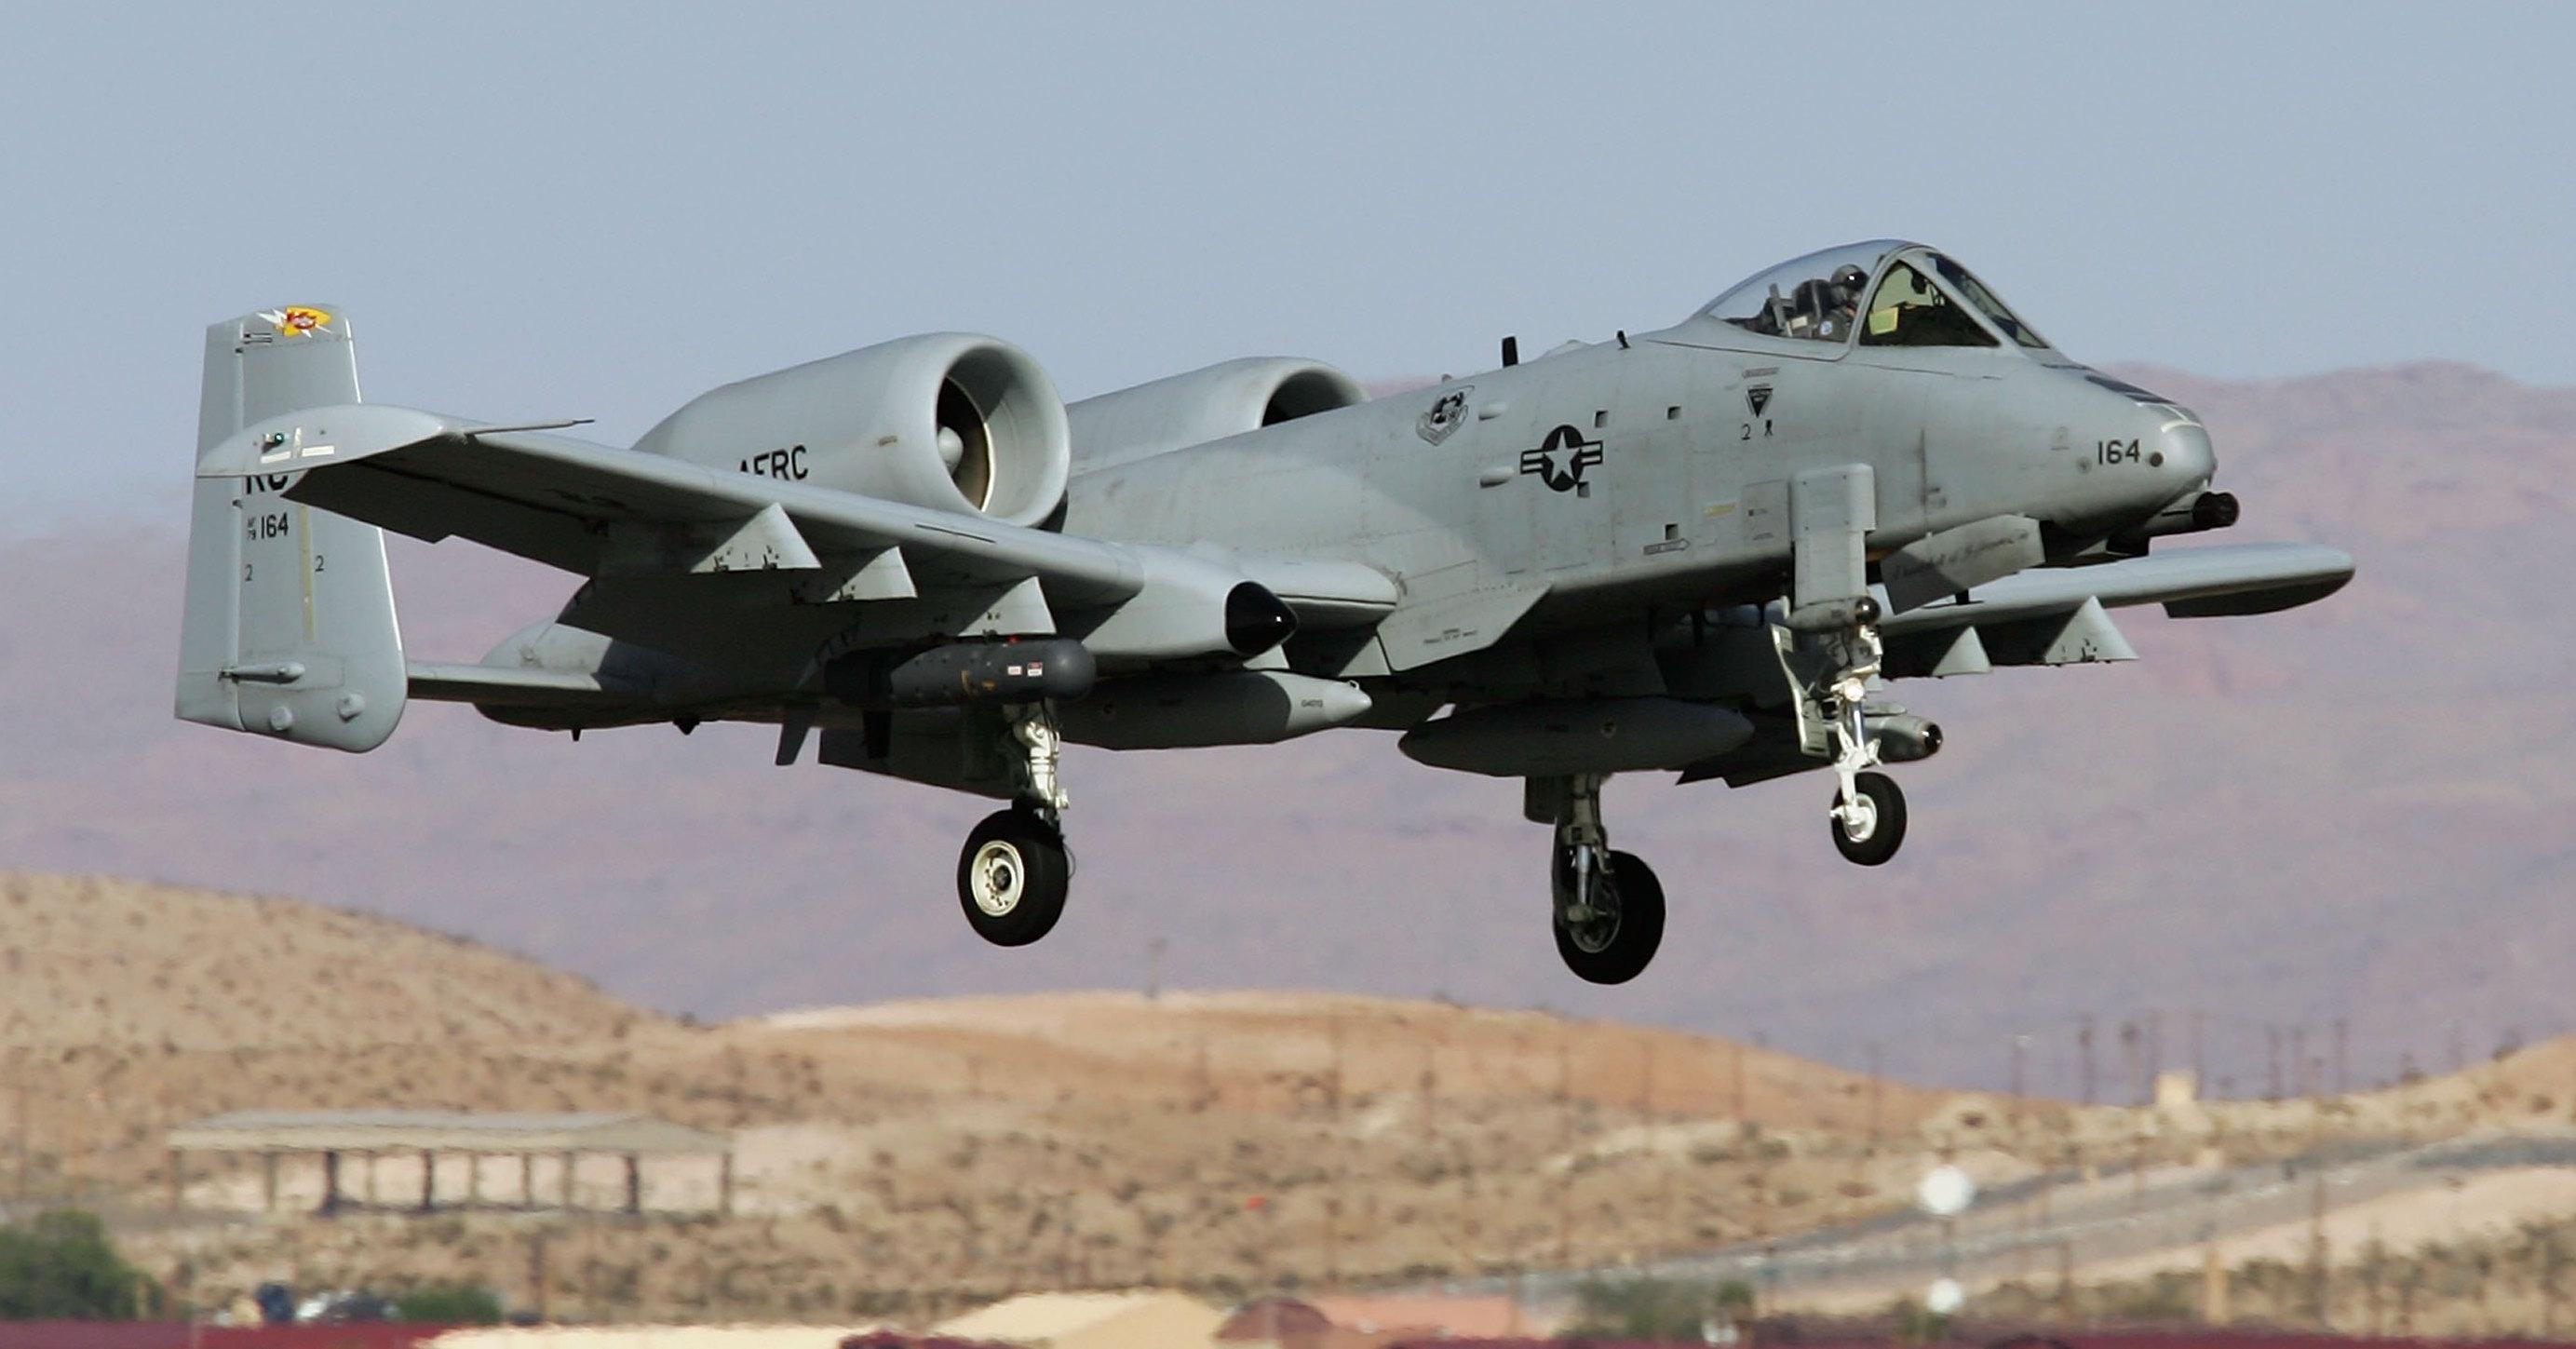 Warthog Plane